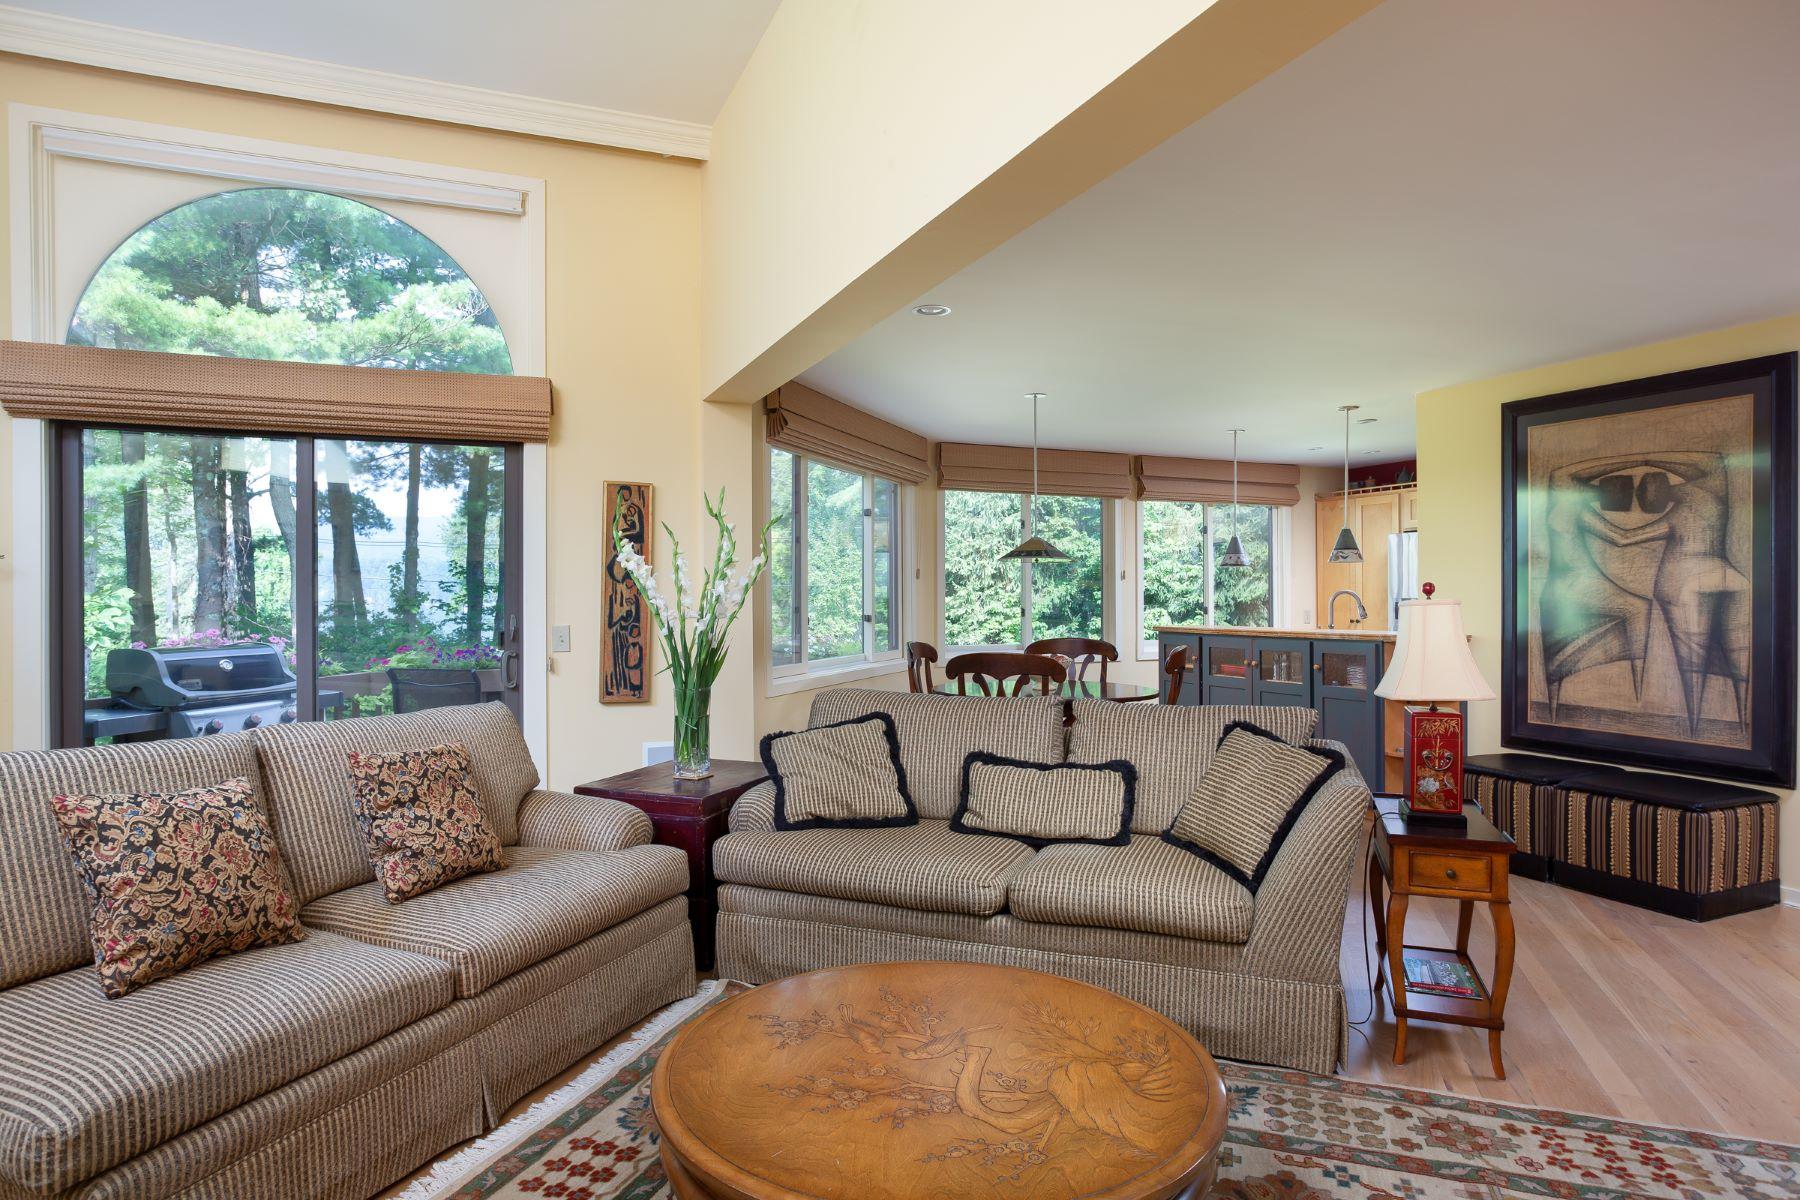 Single Family Home for Active at Lakeside Villa with Stockbridge Bowl Views 23 Hawthorne Rd 14B Stockbridge, Massachusetts 01262 United States